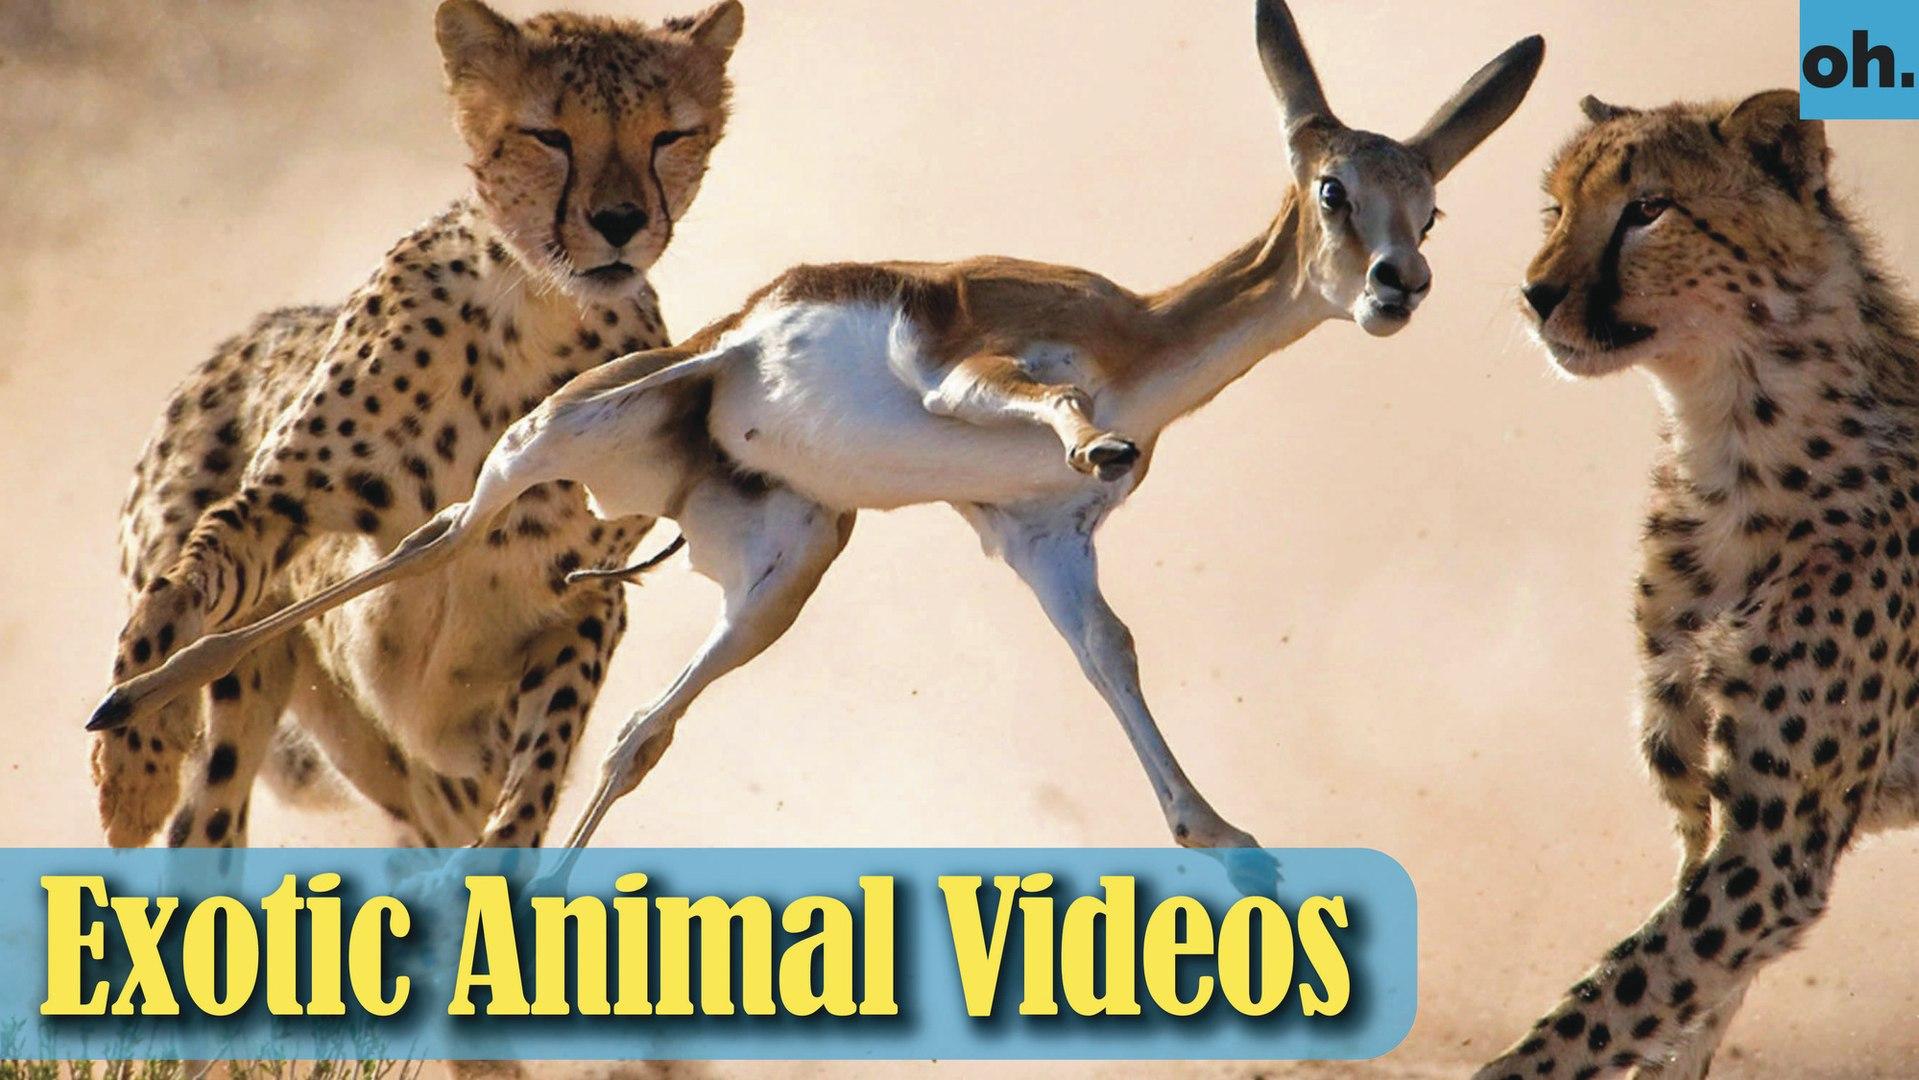 Animal Video - Endangered Animals - Extinct Animals - Rare Animals Zoo - Exotic Animals For Sale P2